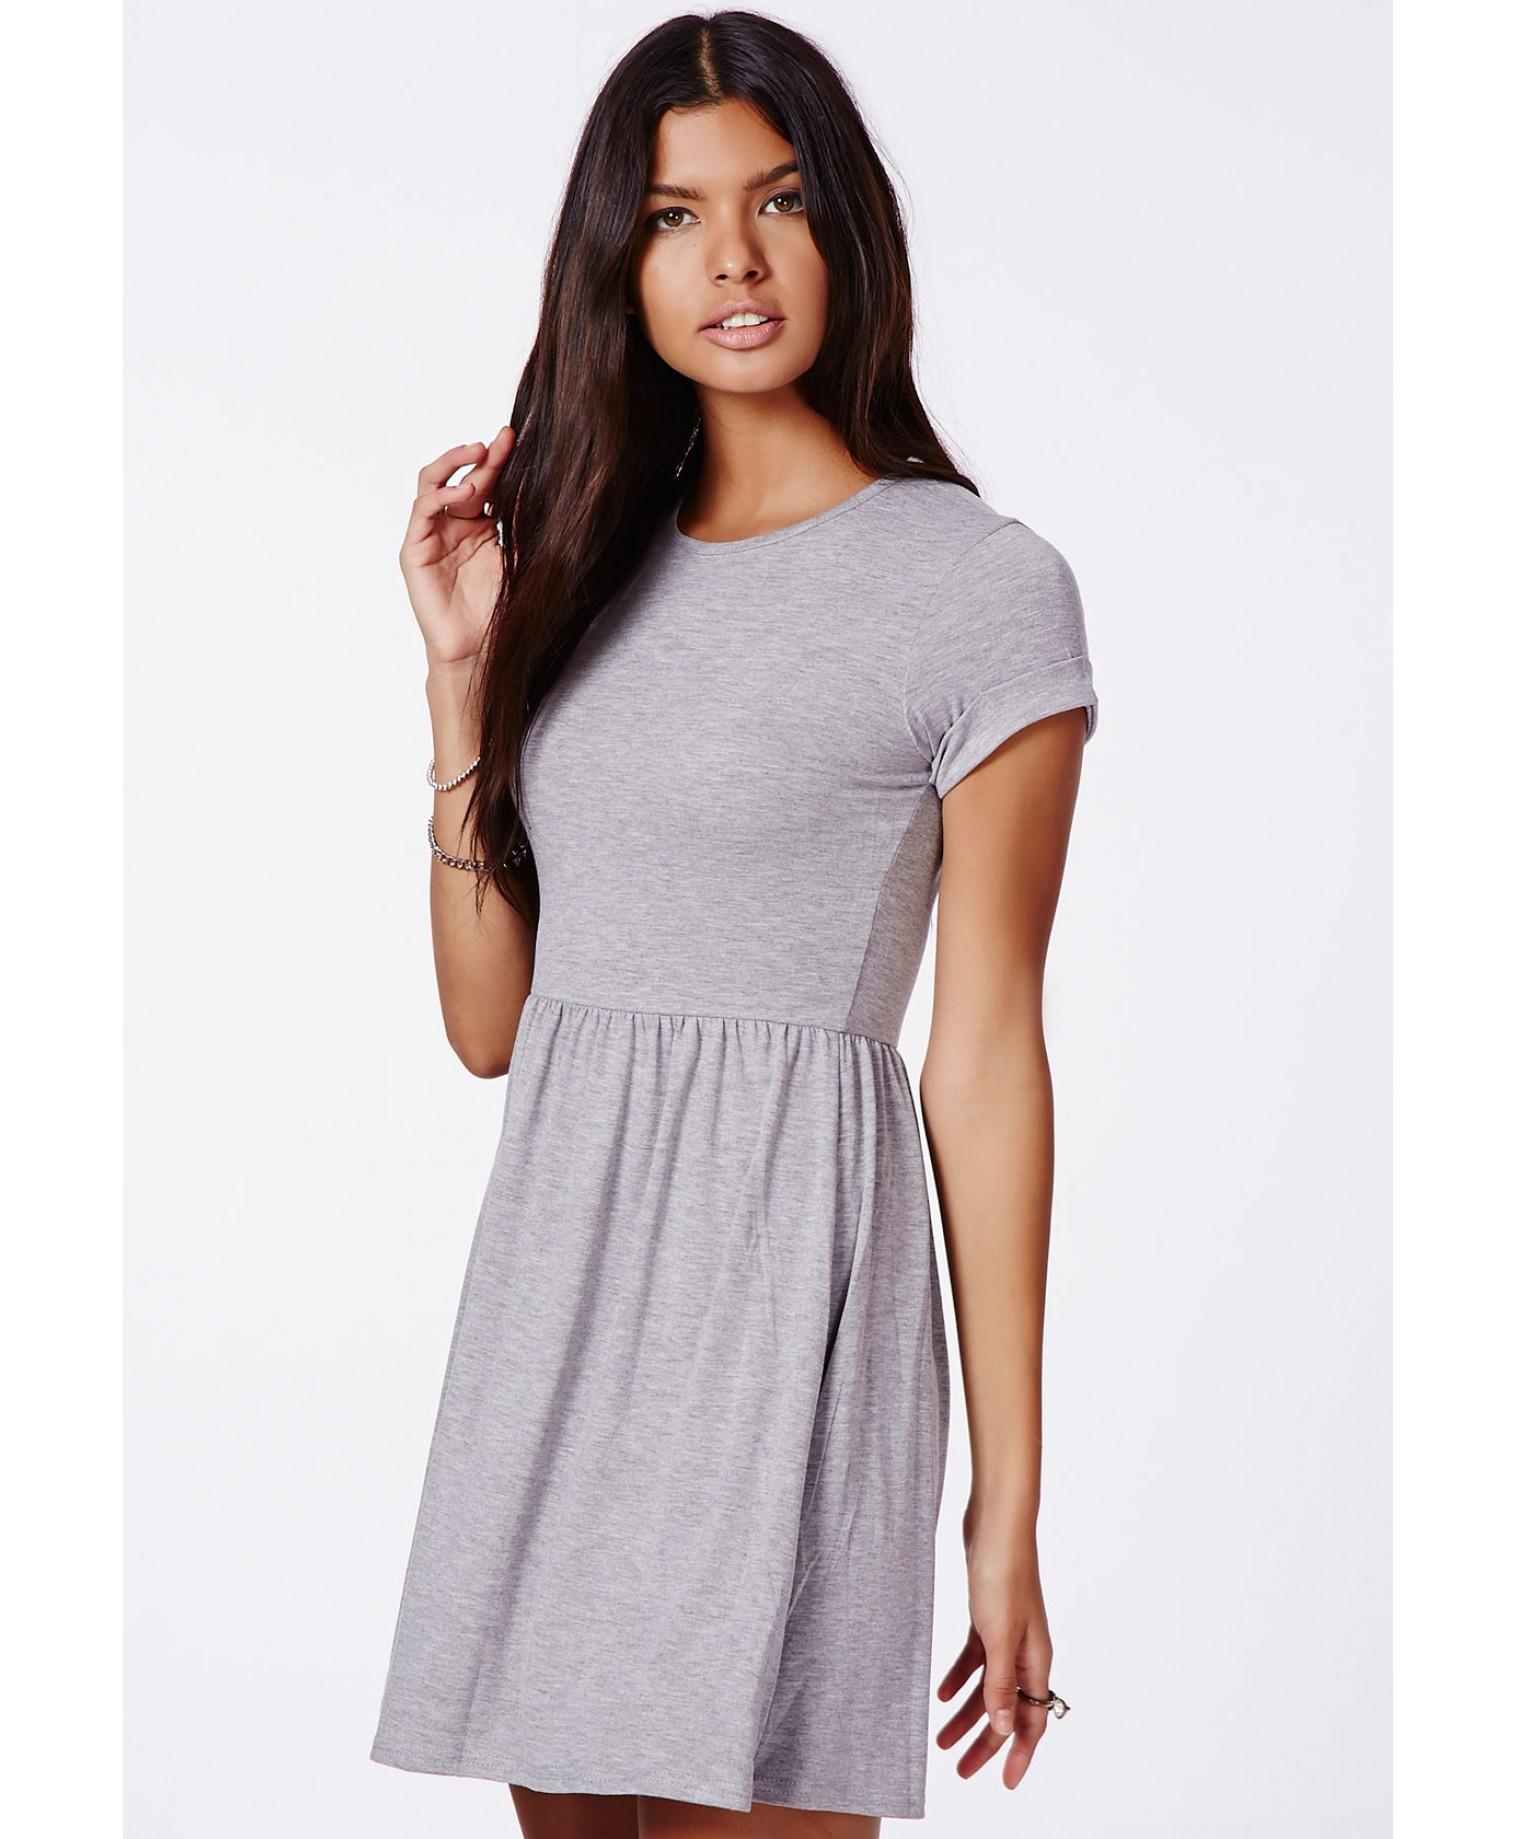 f61fa75ee19e Missguided Aliveta T-Shirt Skater Dress in Gray - Lyst